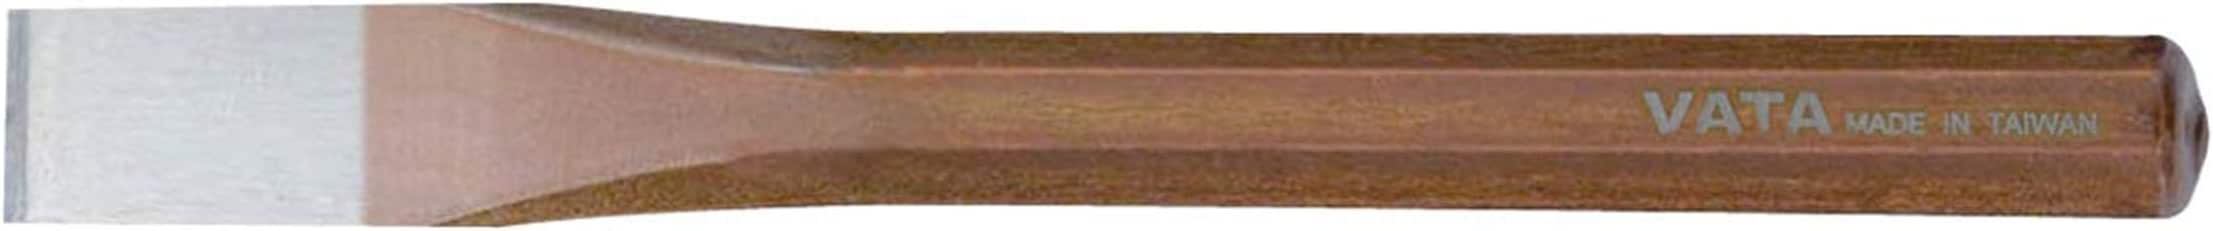 FLAT CHISEL 250mmx26mmTIP